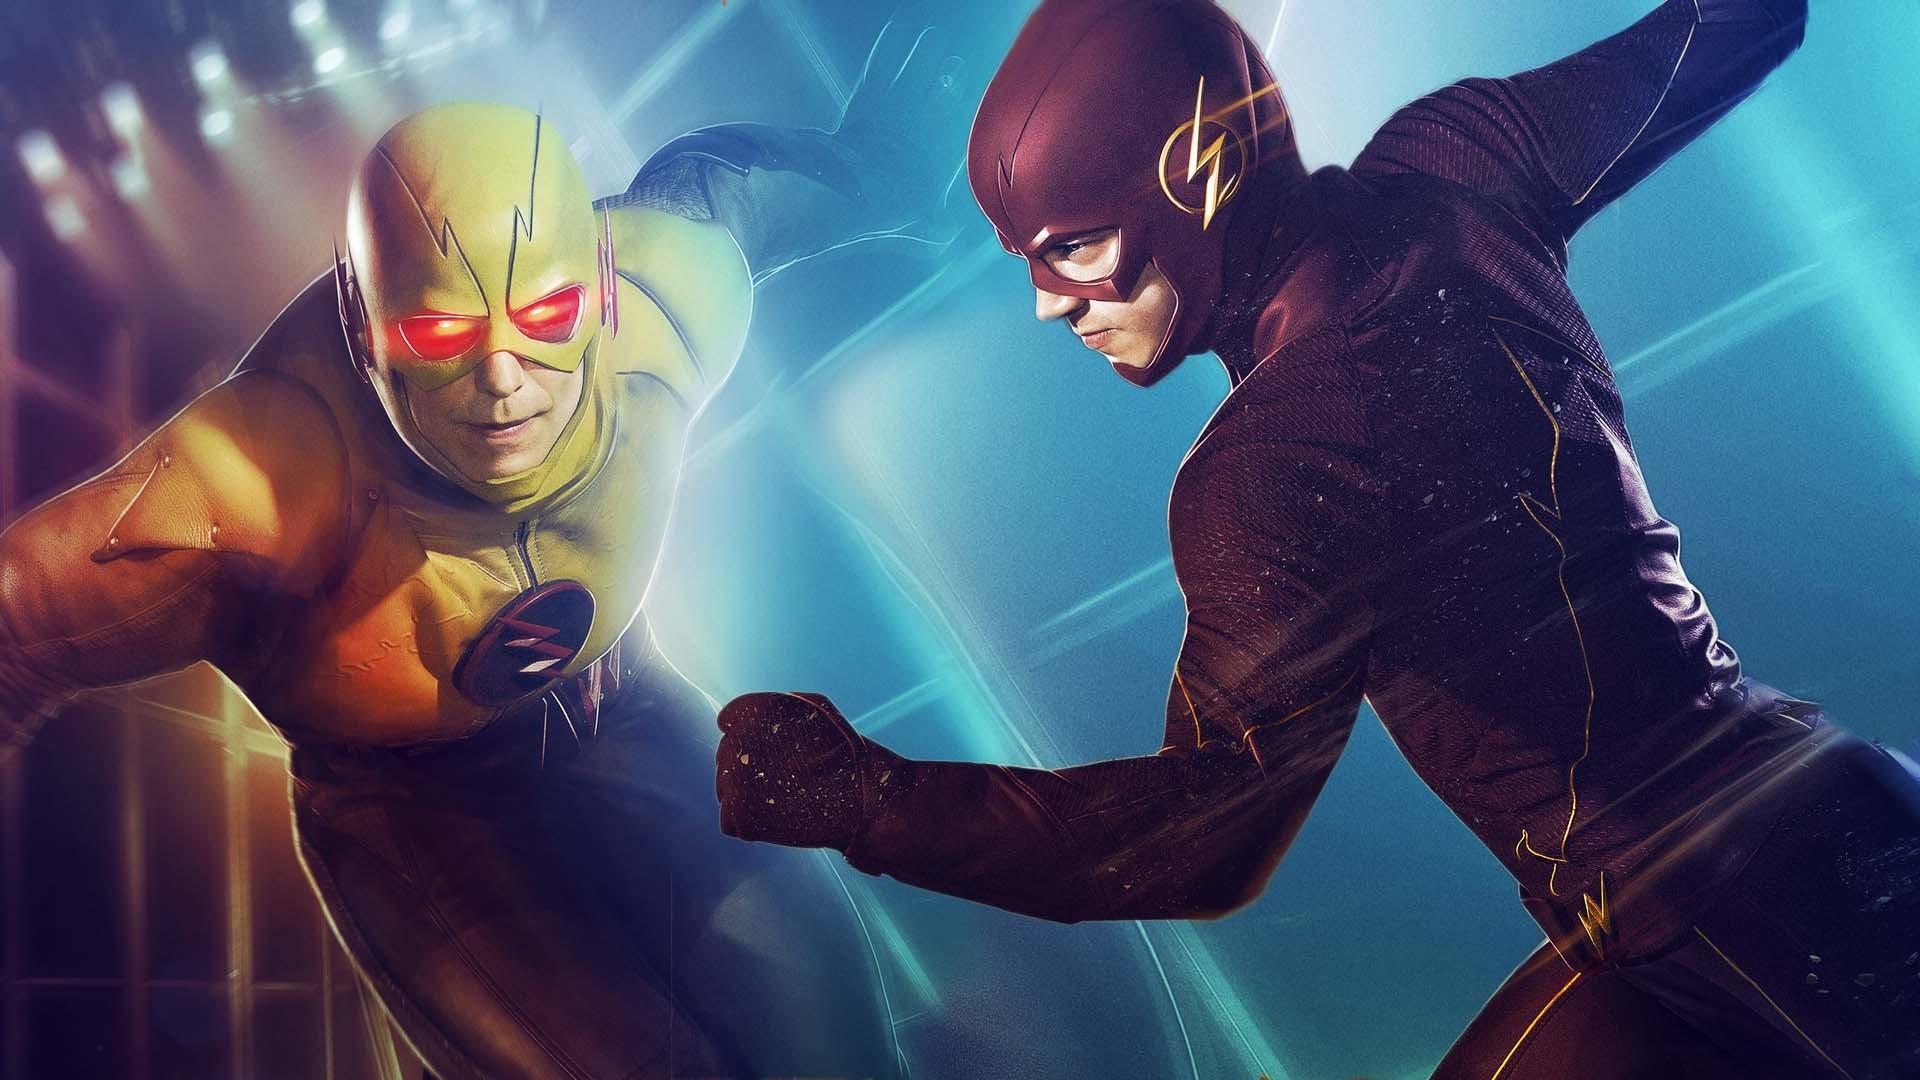 Supergirl Hd Wallpapers 1080p The Flash Wallpapers Flash Fondos De Pantalla Hd